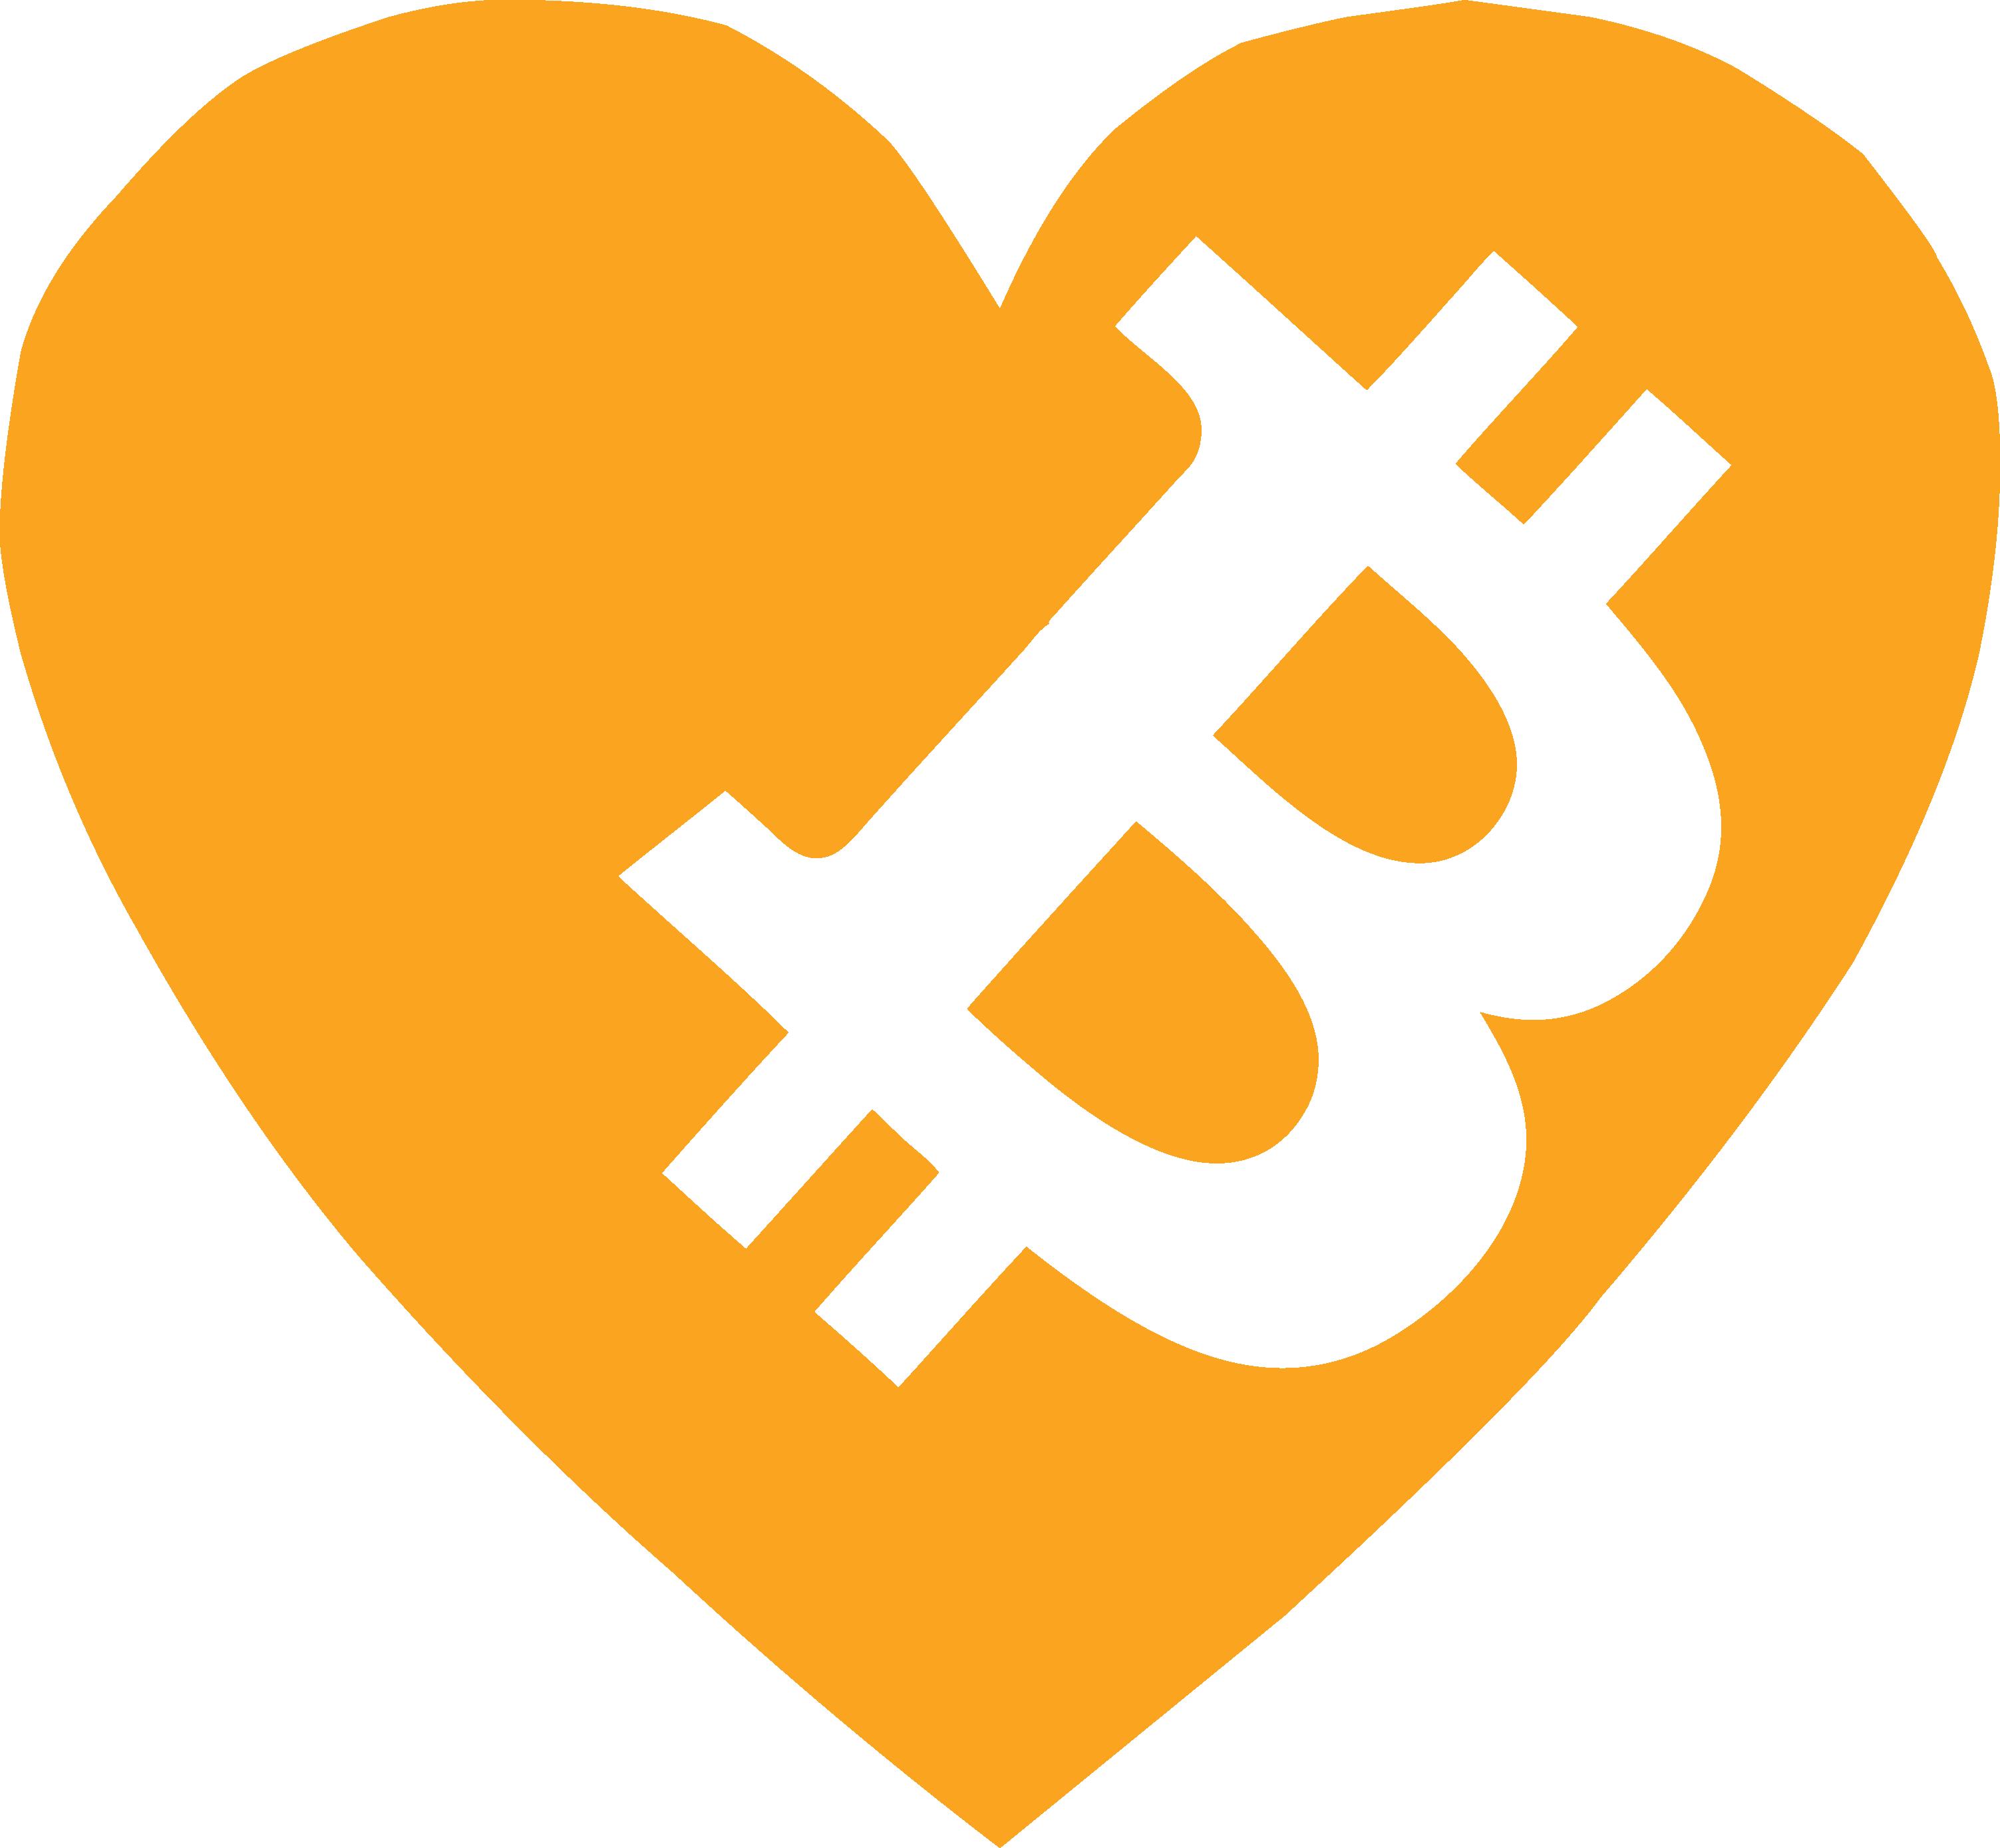 bitcoin png images free download bitcoin logo png